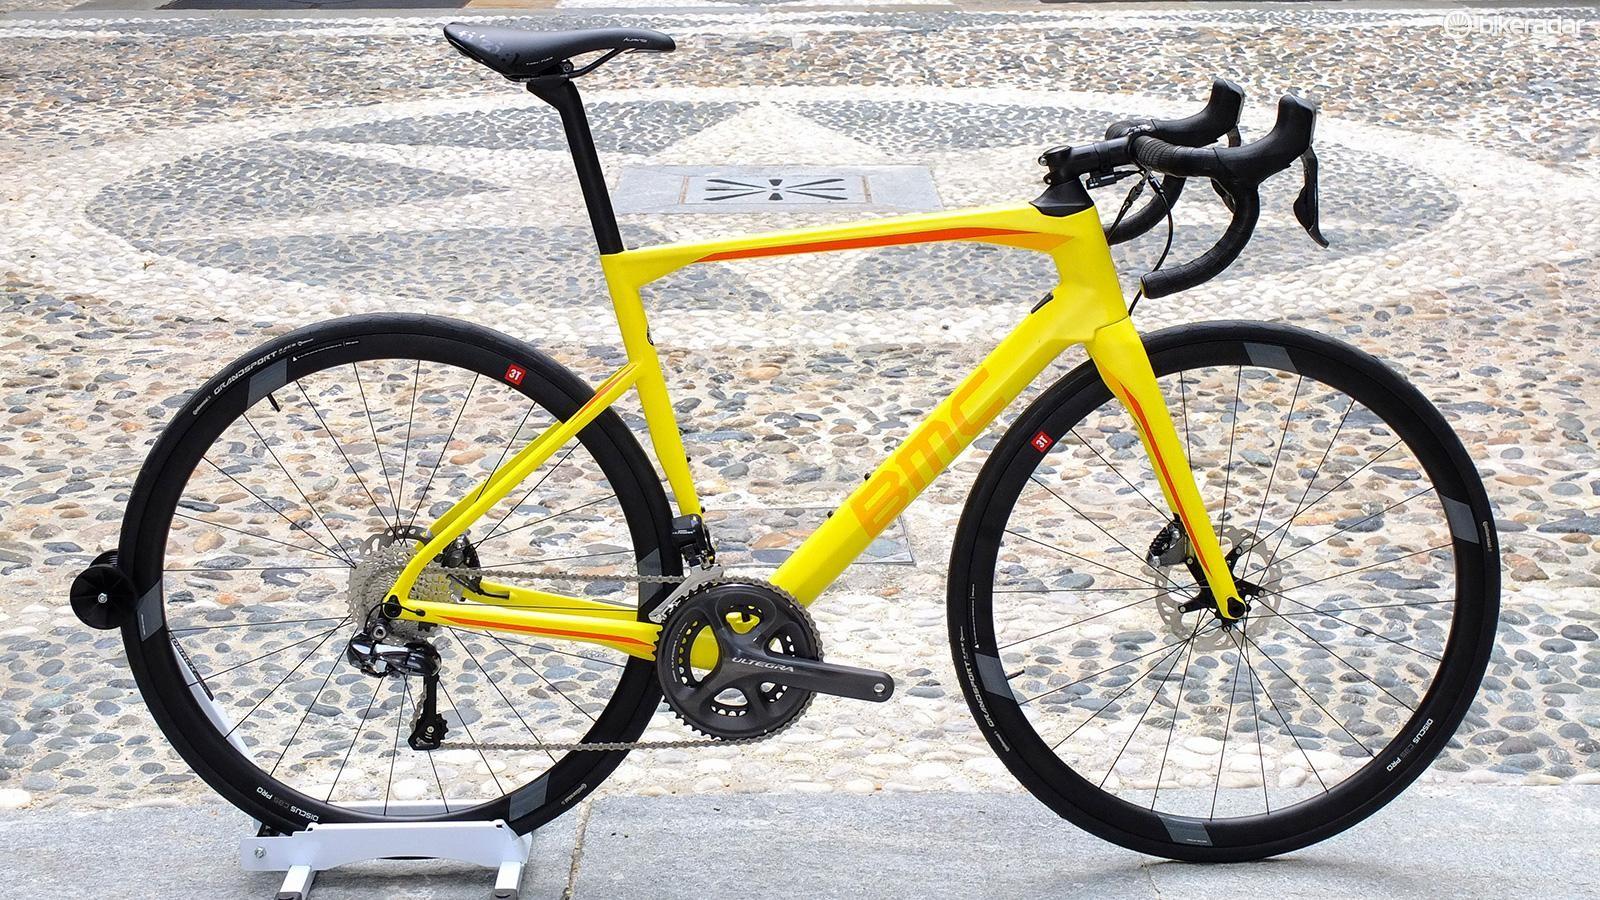 Roadmachine 02 Ultegra Di2 in Yellow